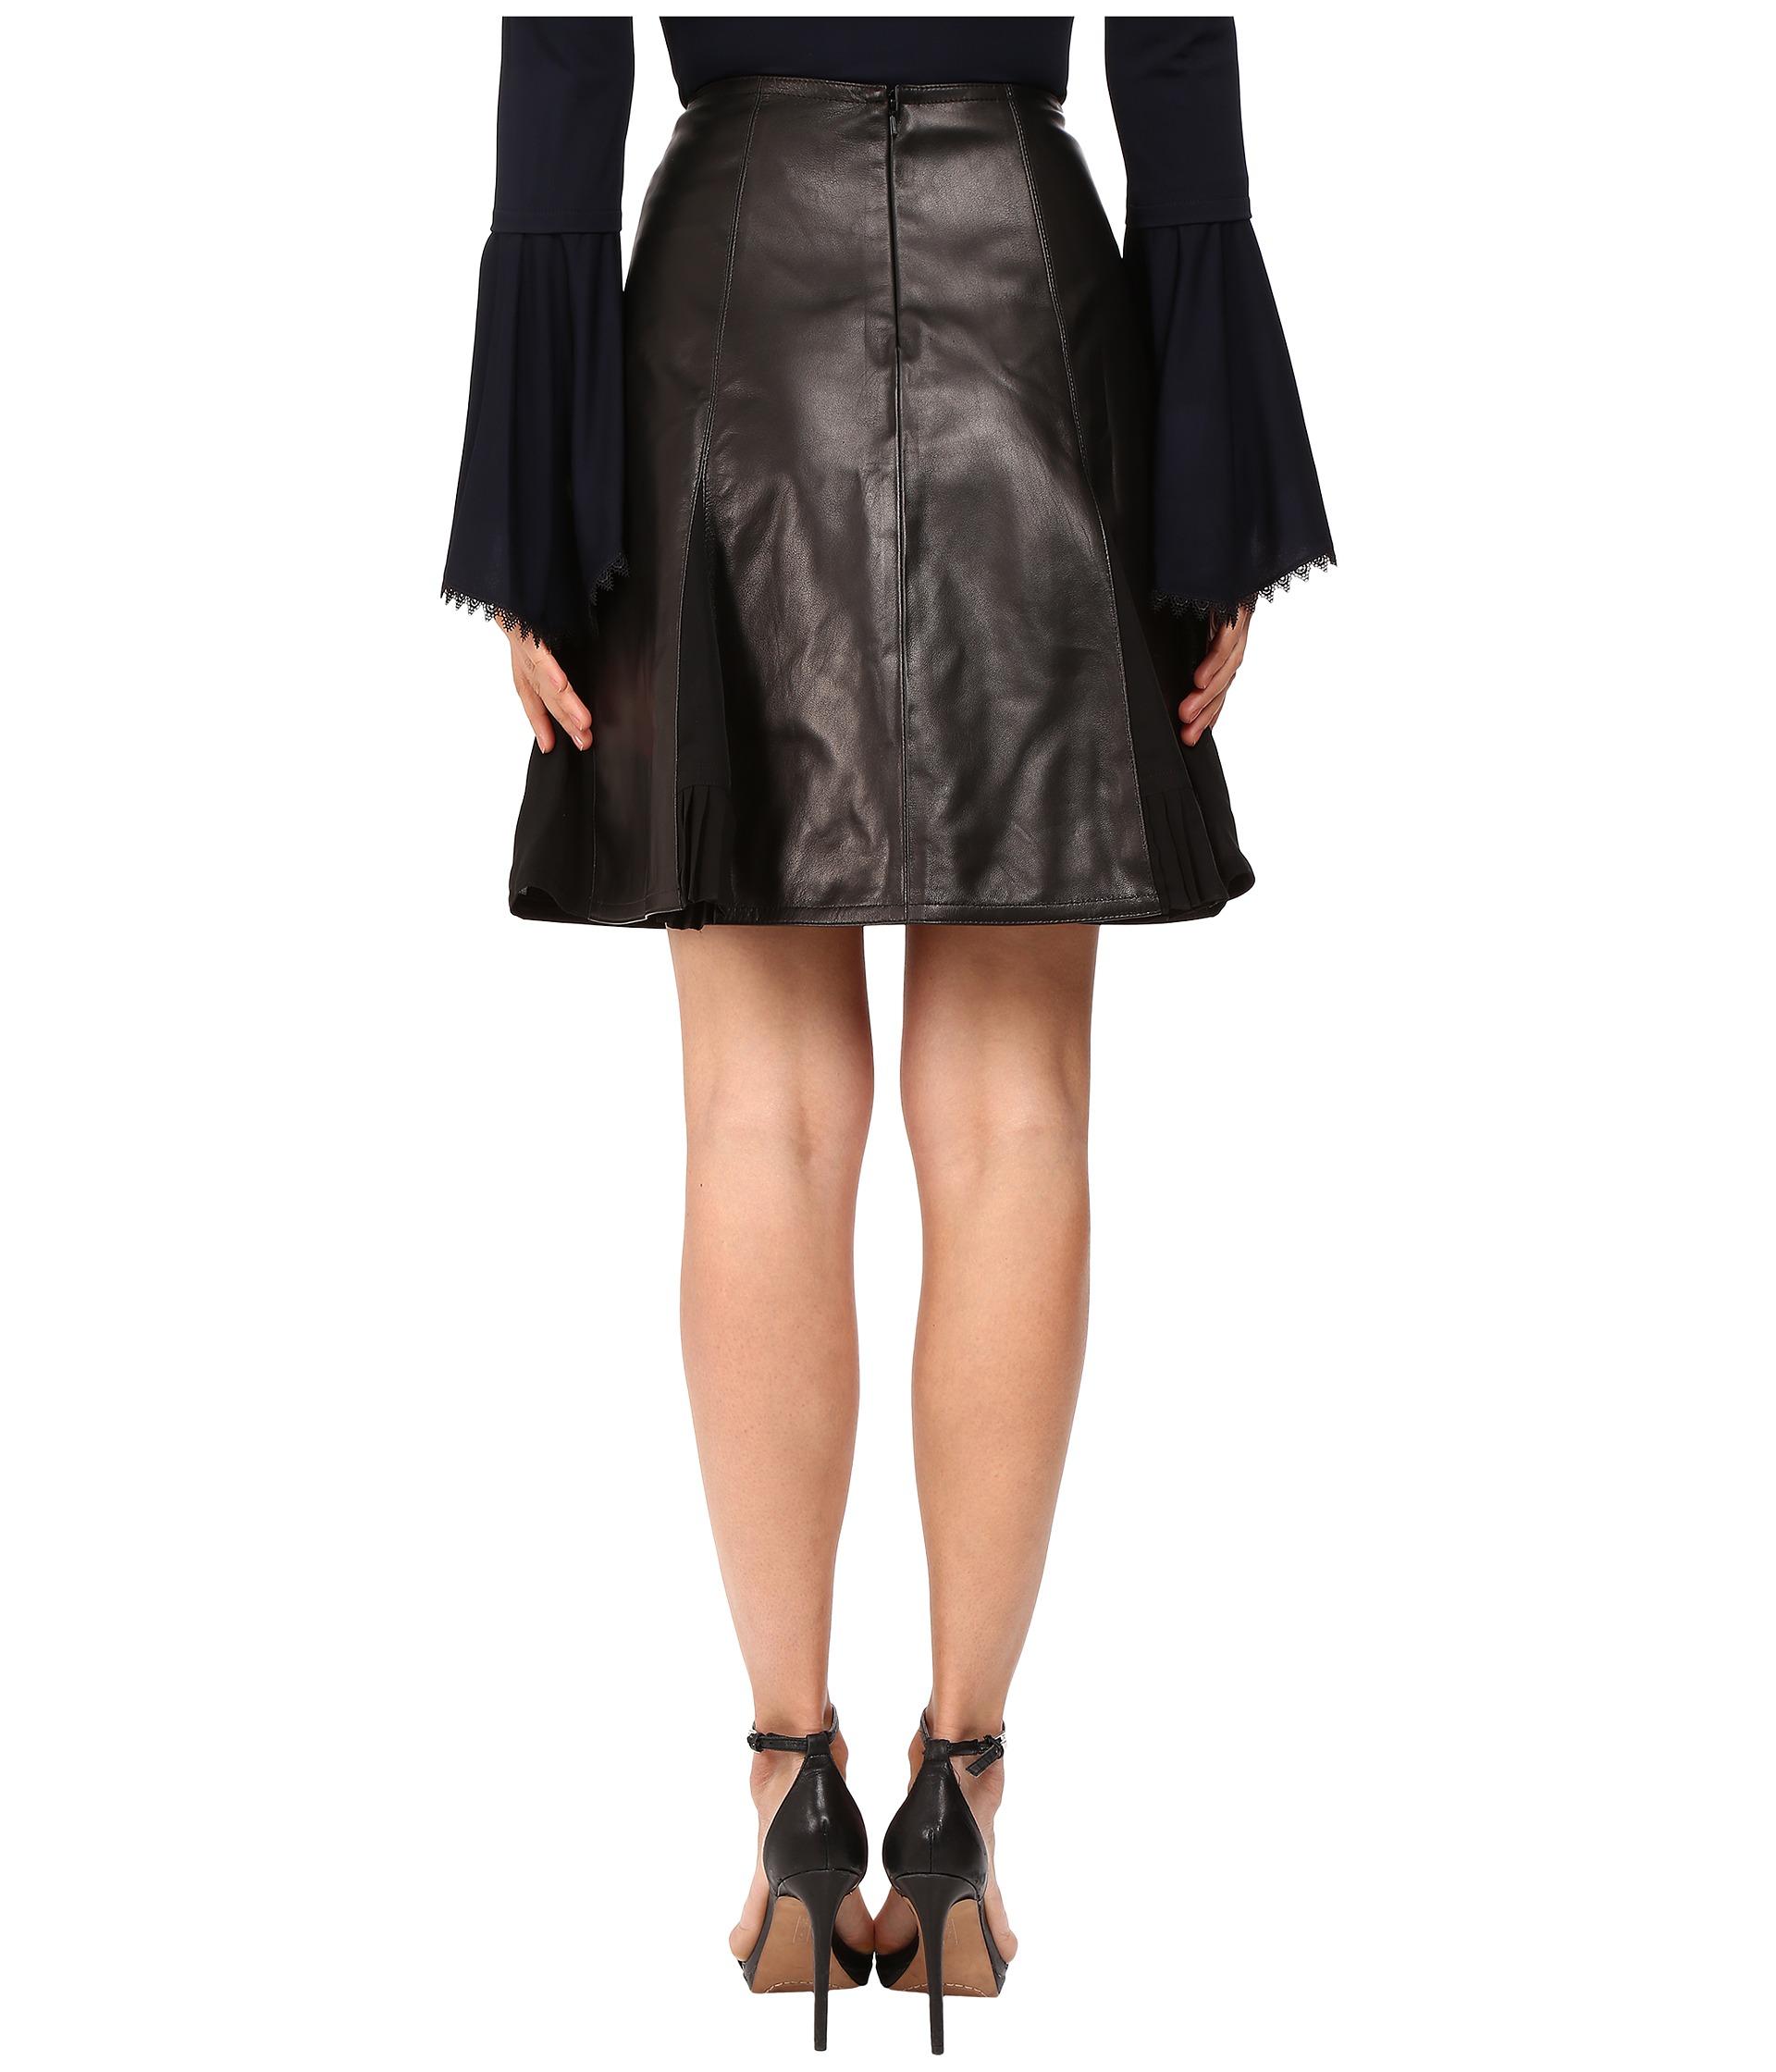 Flair Skirt 83